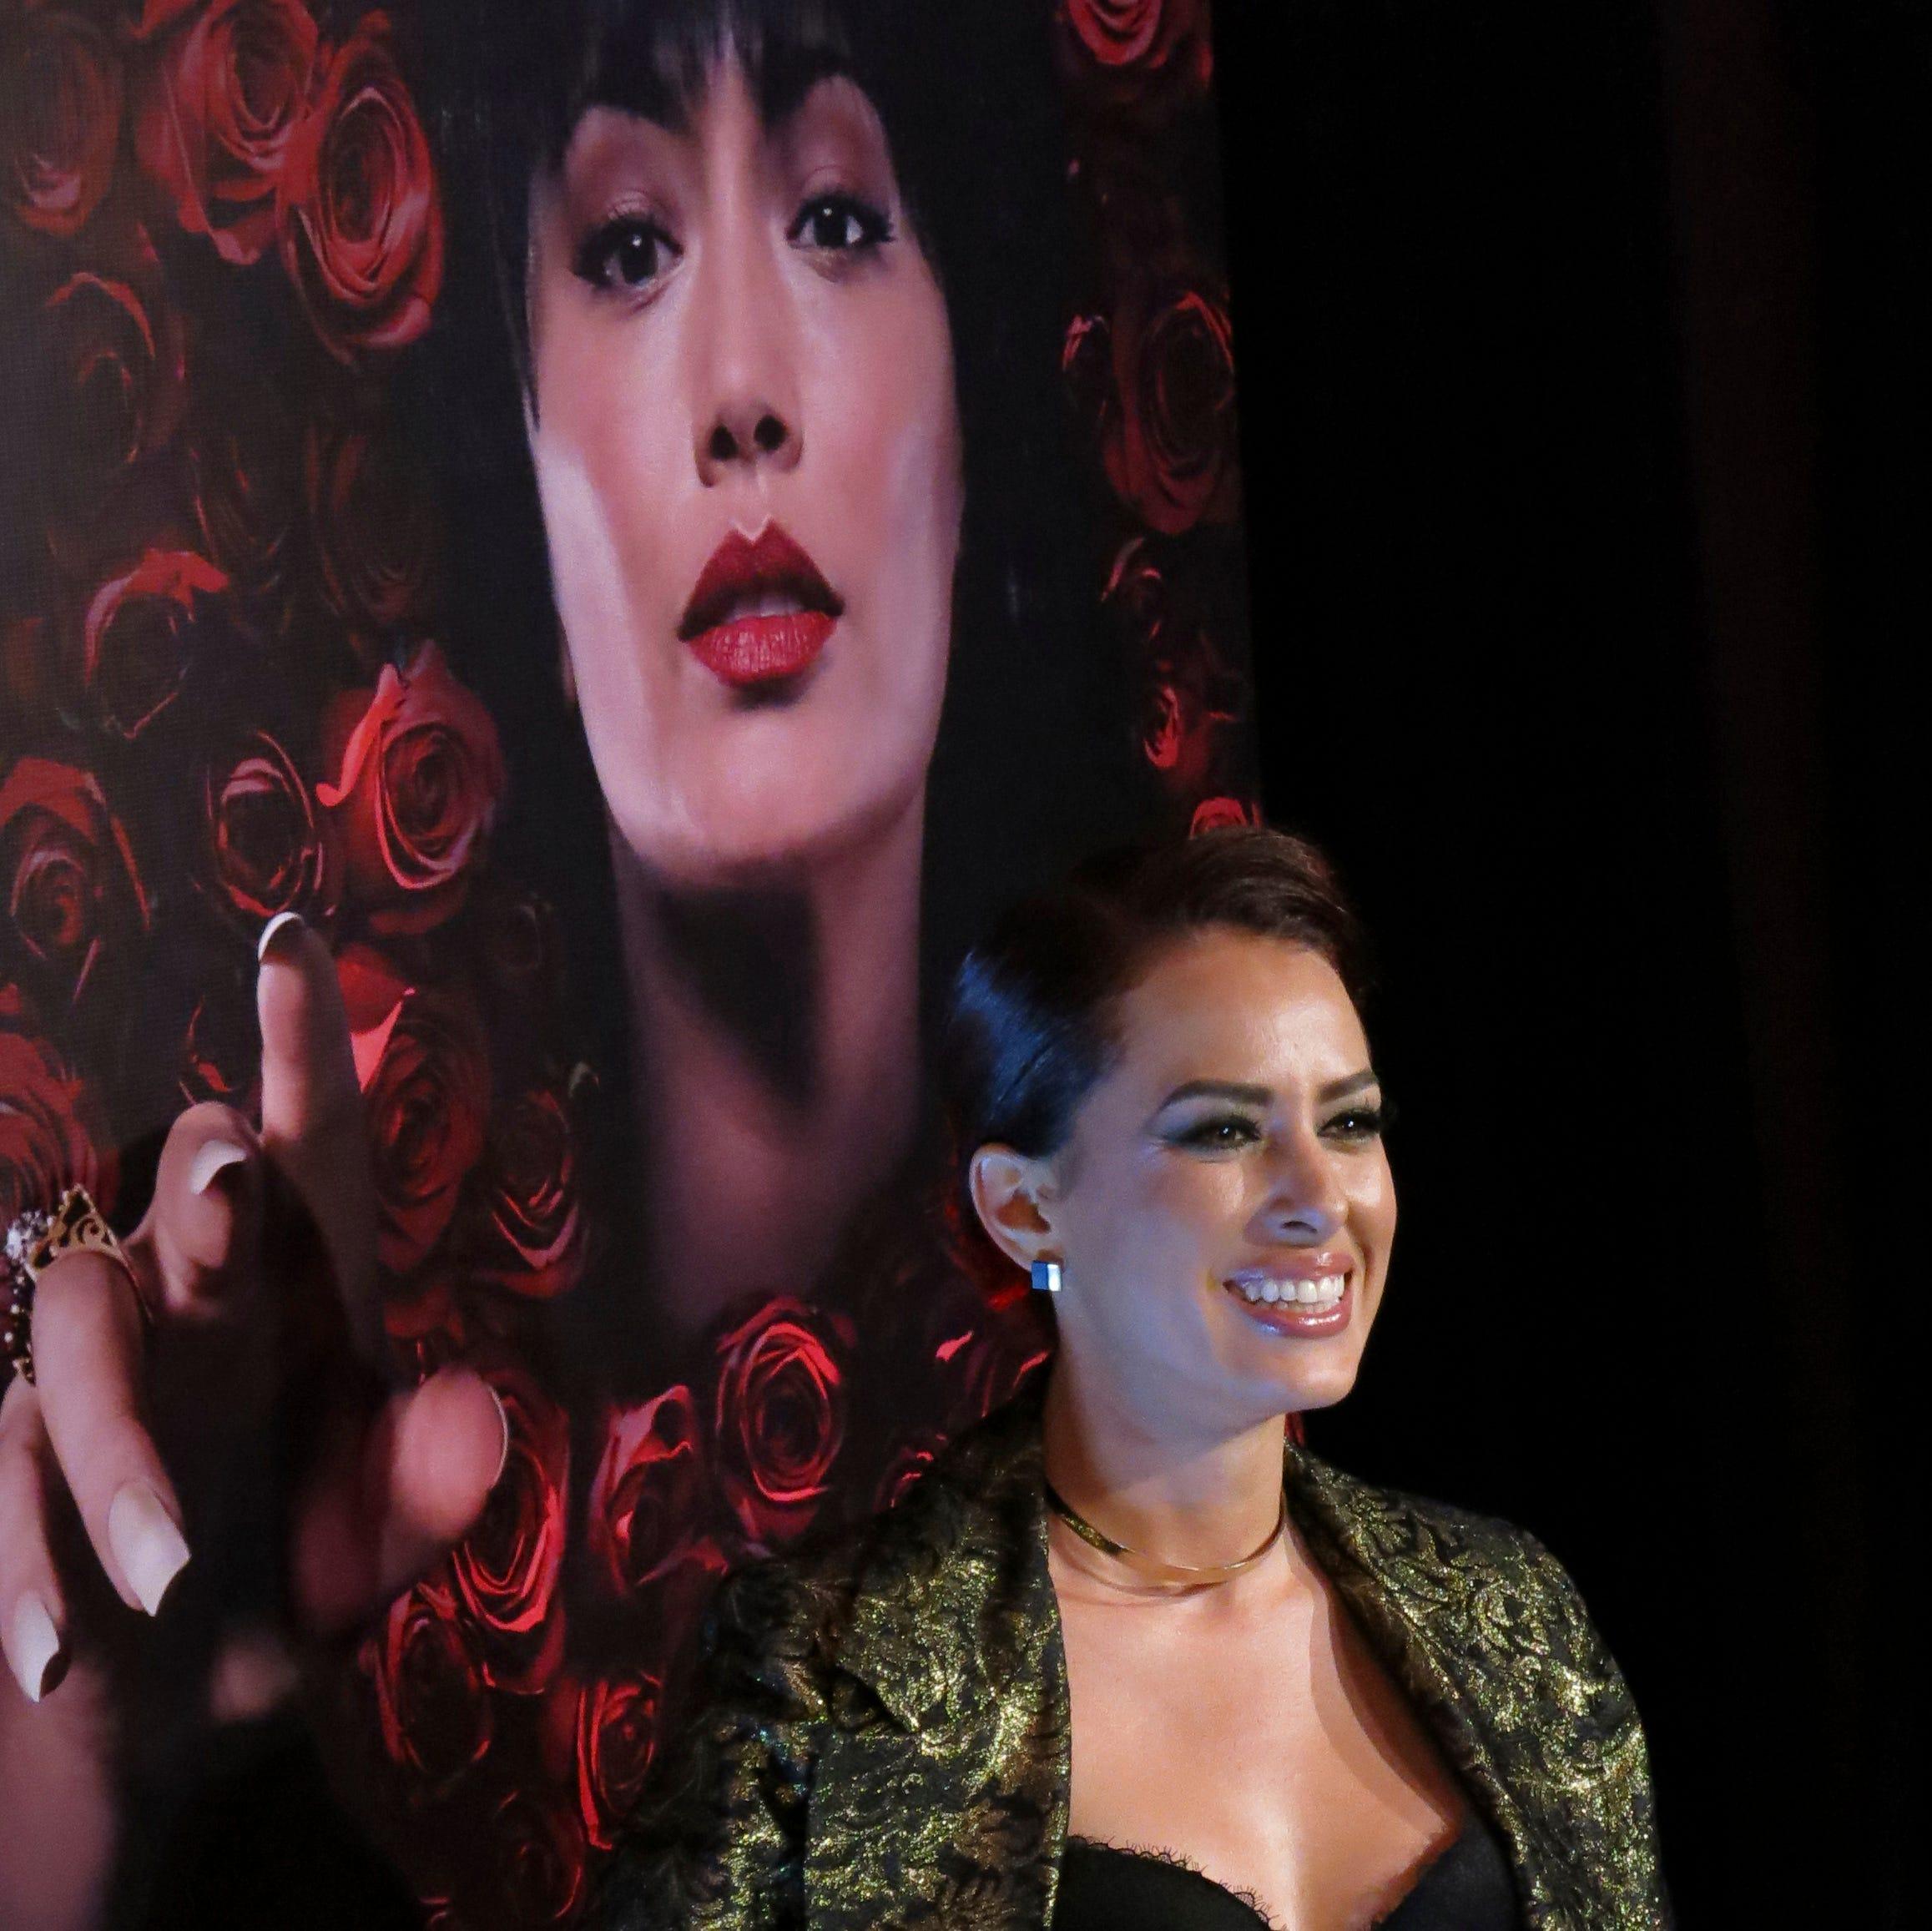 'El Secreto de Selena' TV series to show on TNT in Mexico